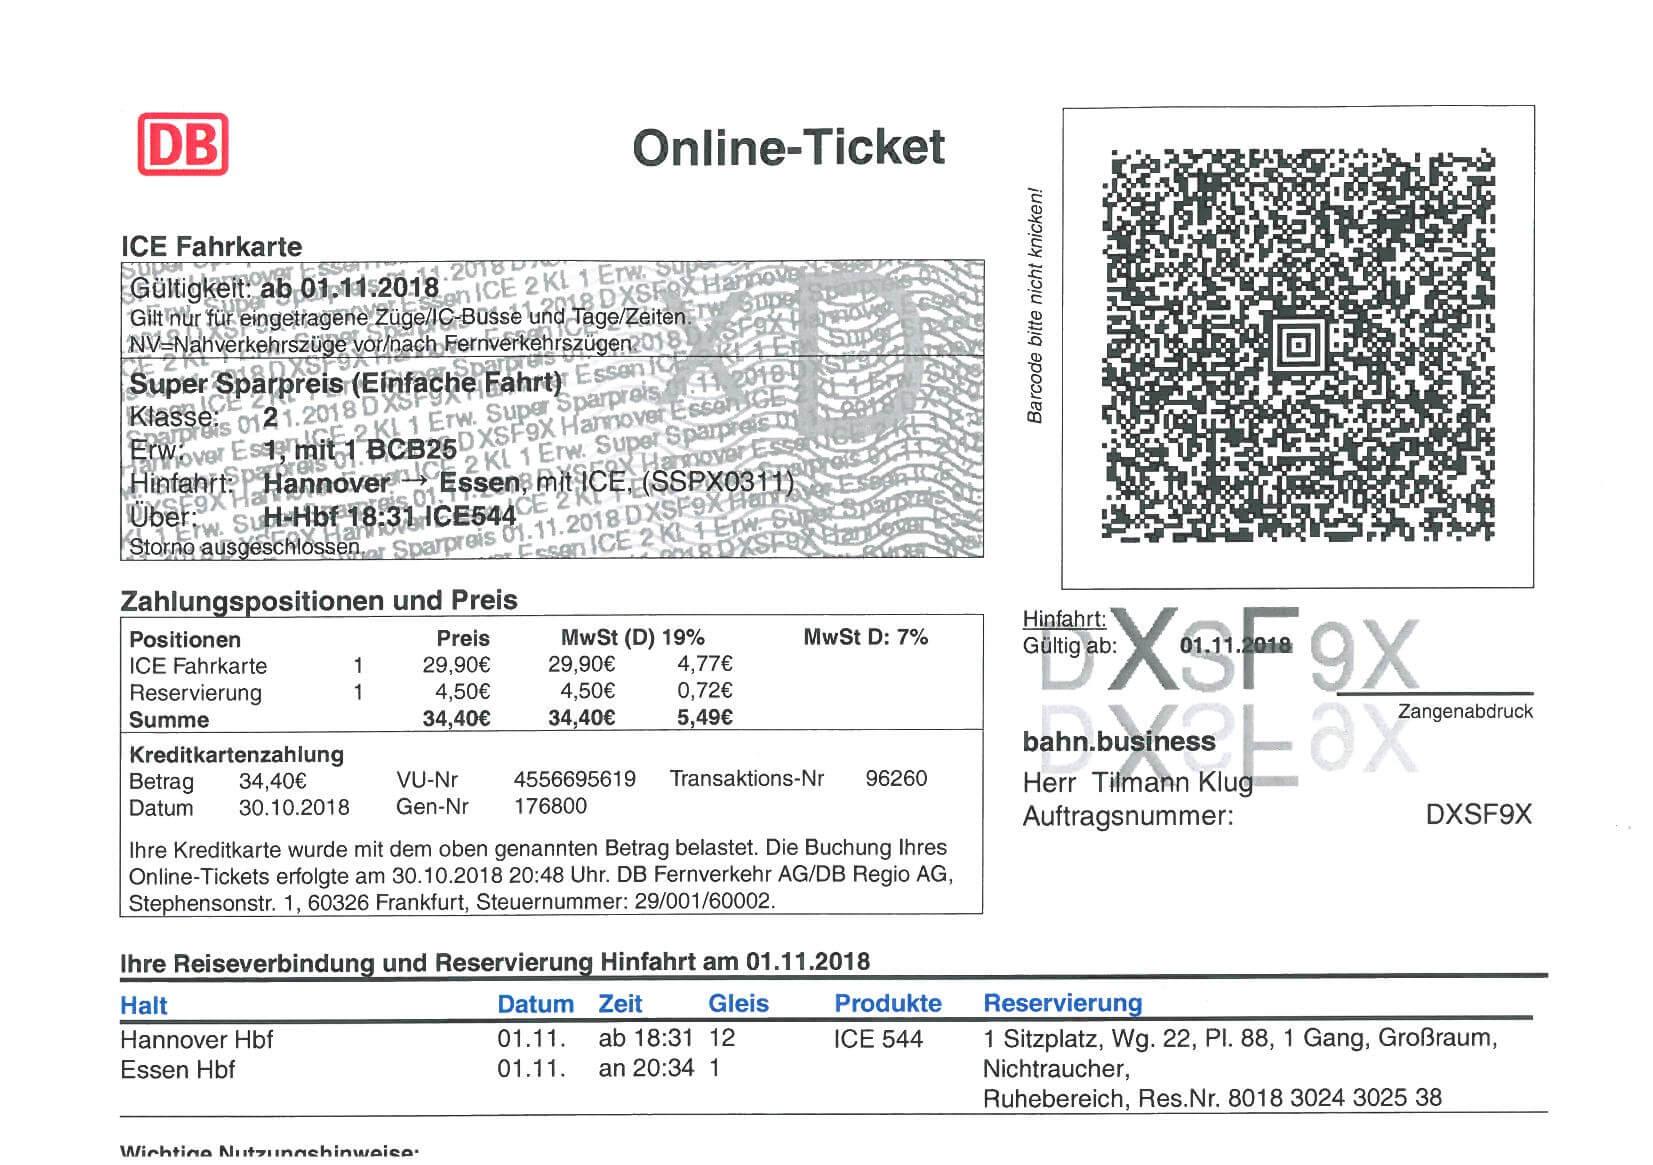 online tickets deutsche bahn vorsteuerabzug bedenbecker berg steuerberatung. Black Bedroom Furniture Sets. Home Design Ideas